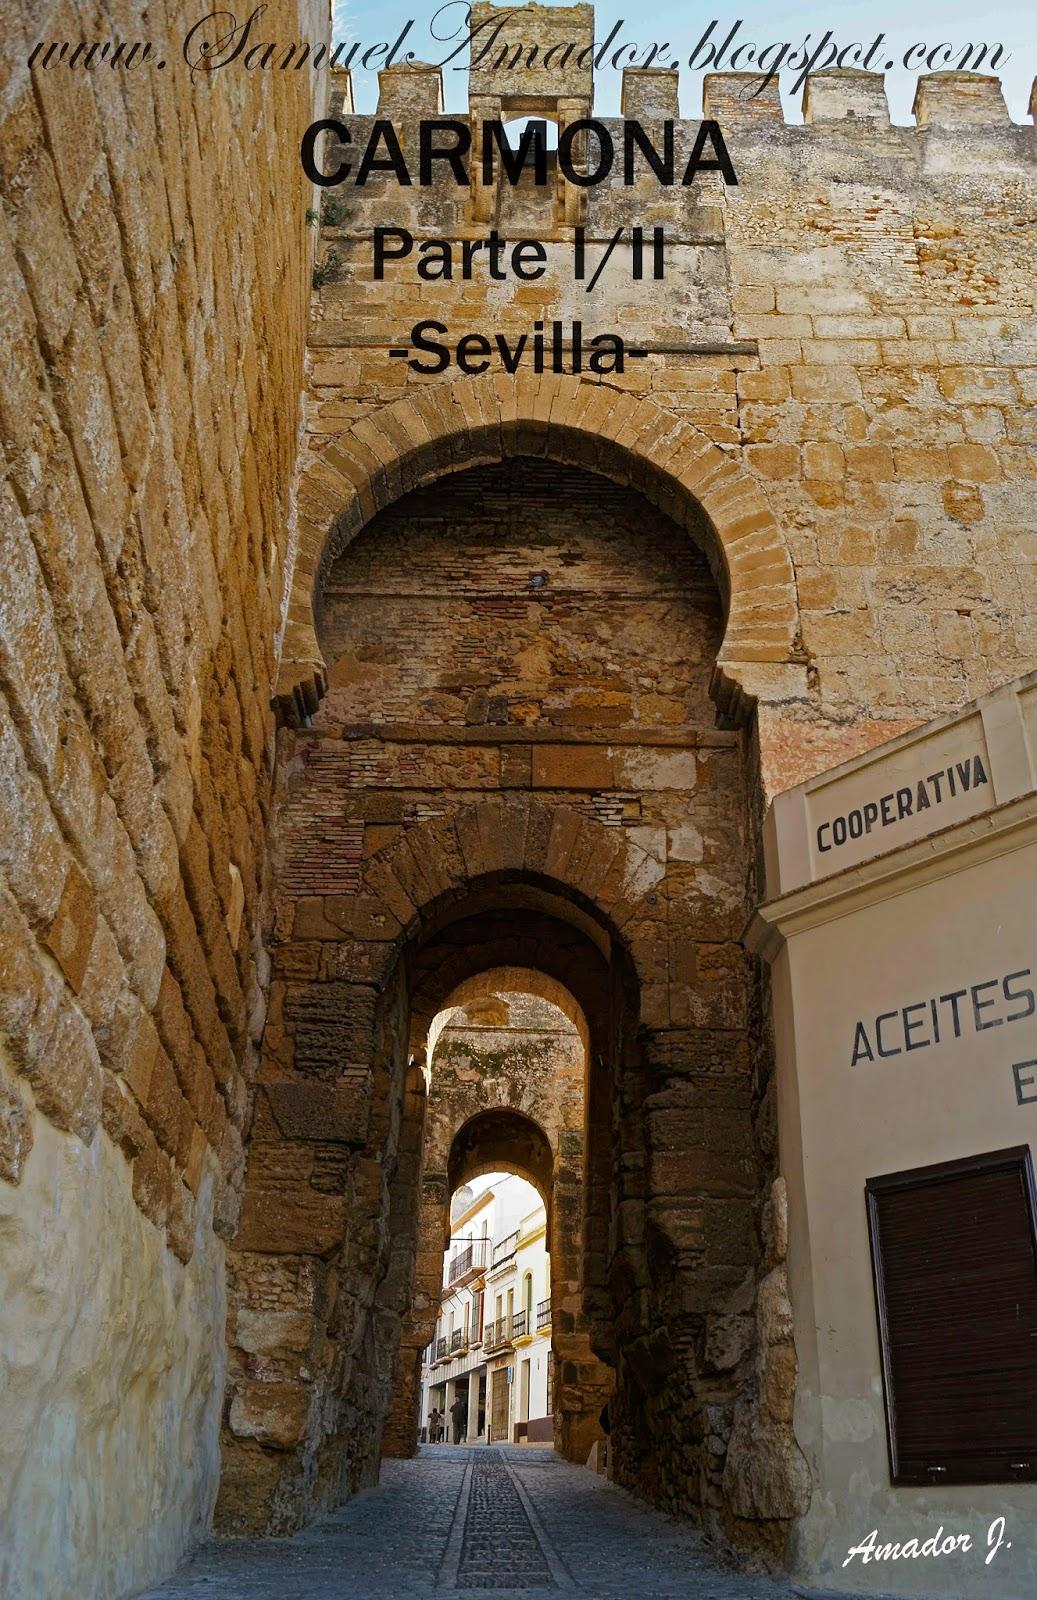 Samuel amador carmona parte 1 2 sevilla for Puerta de sevilla carmona